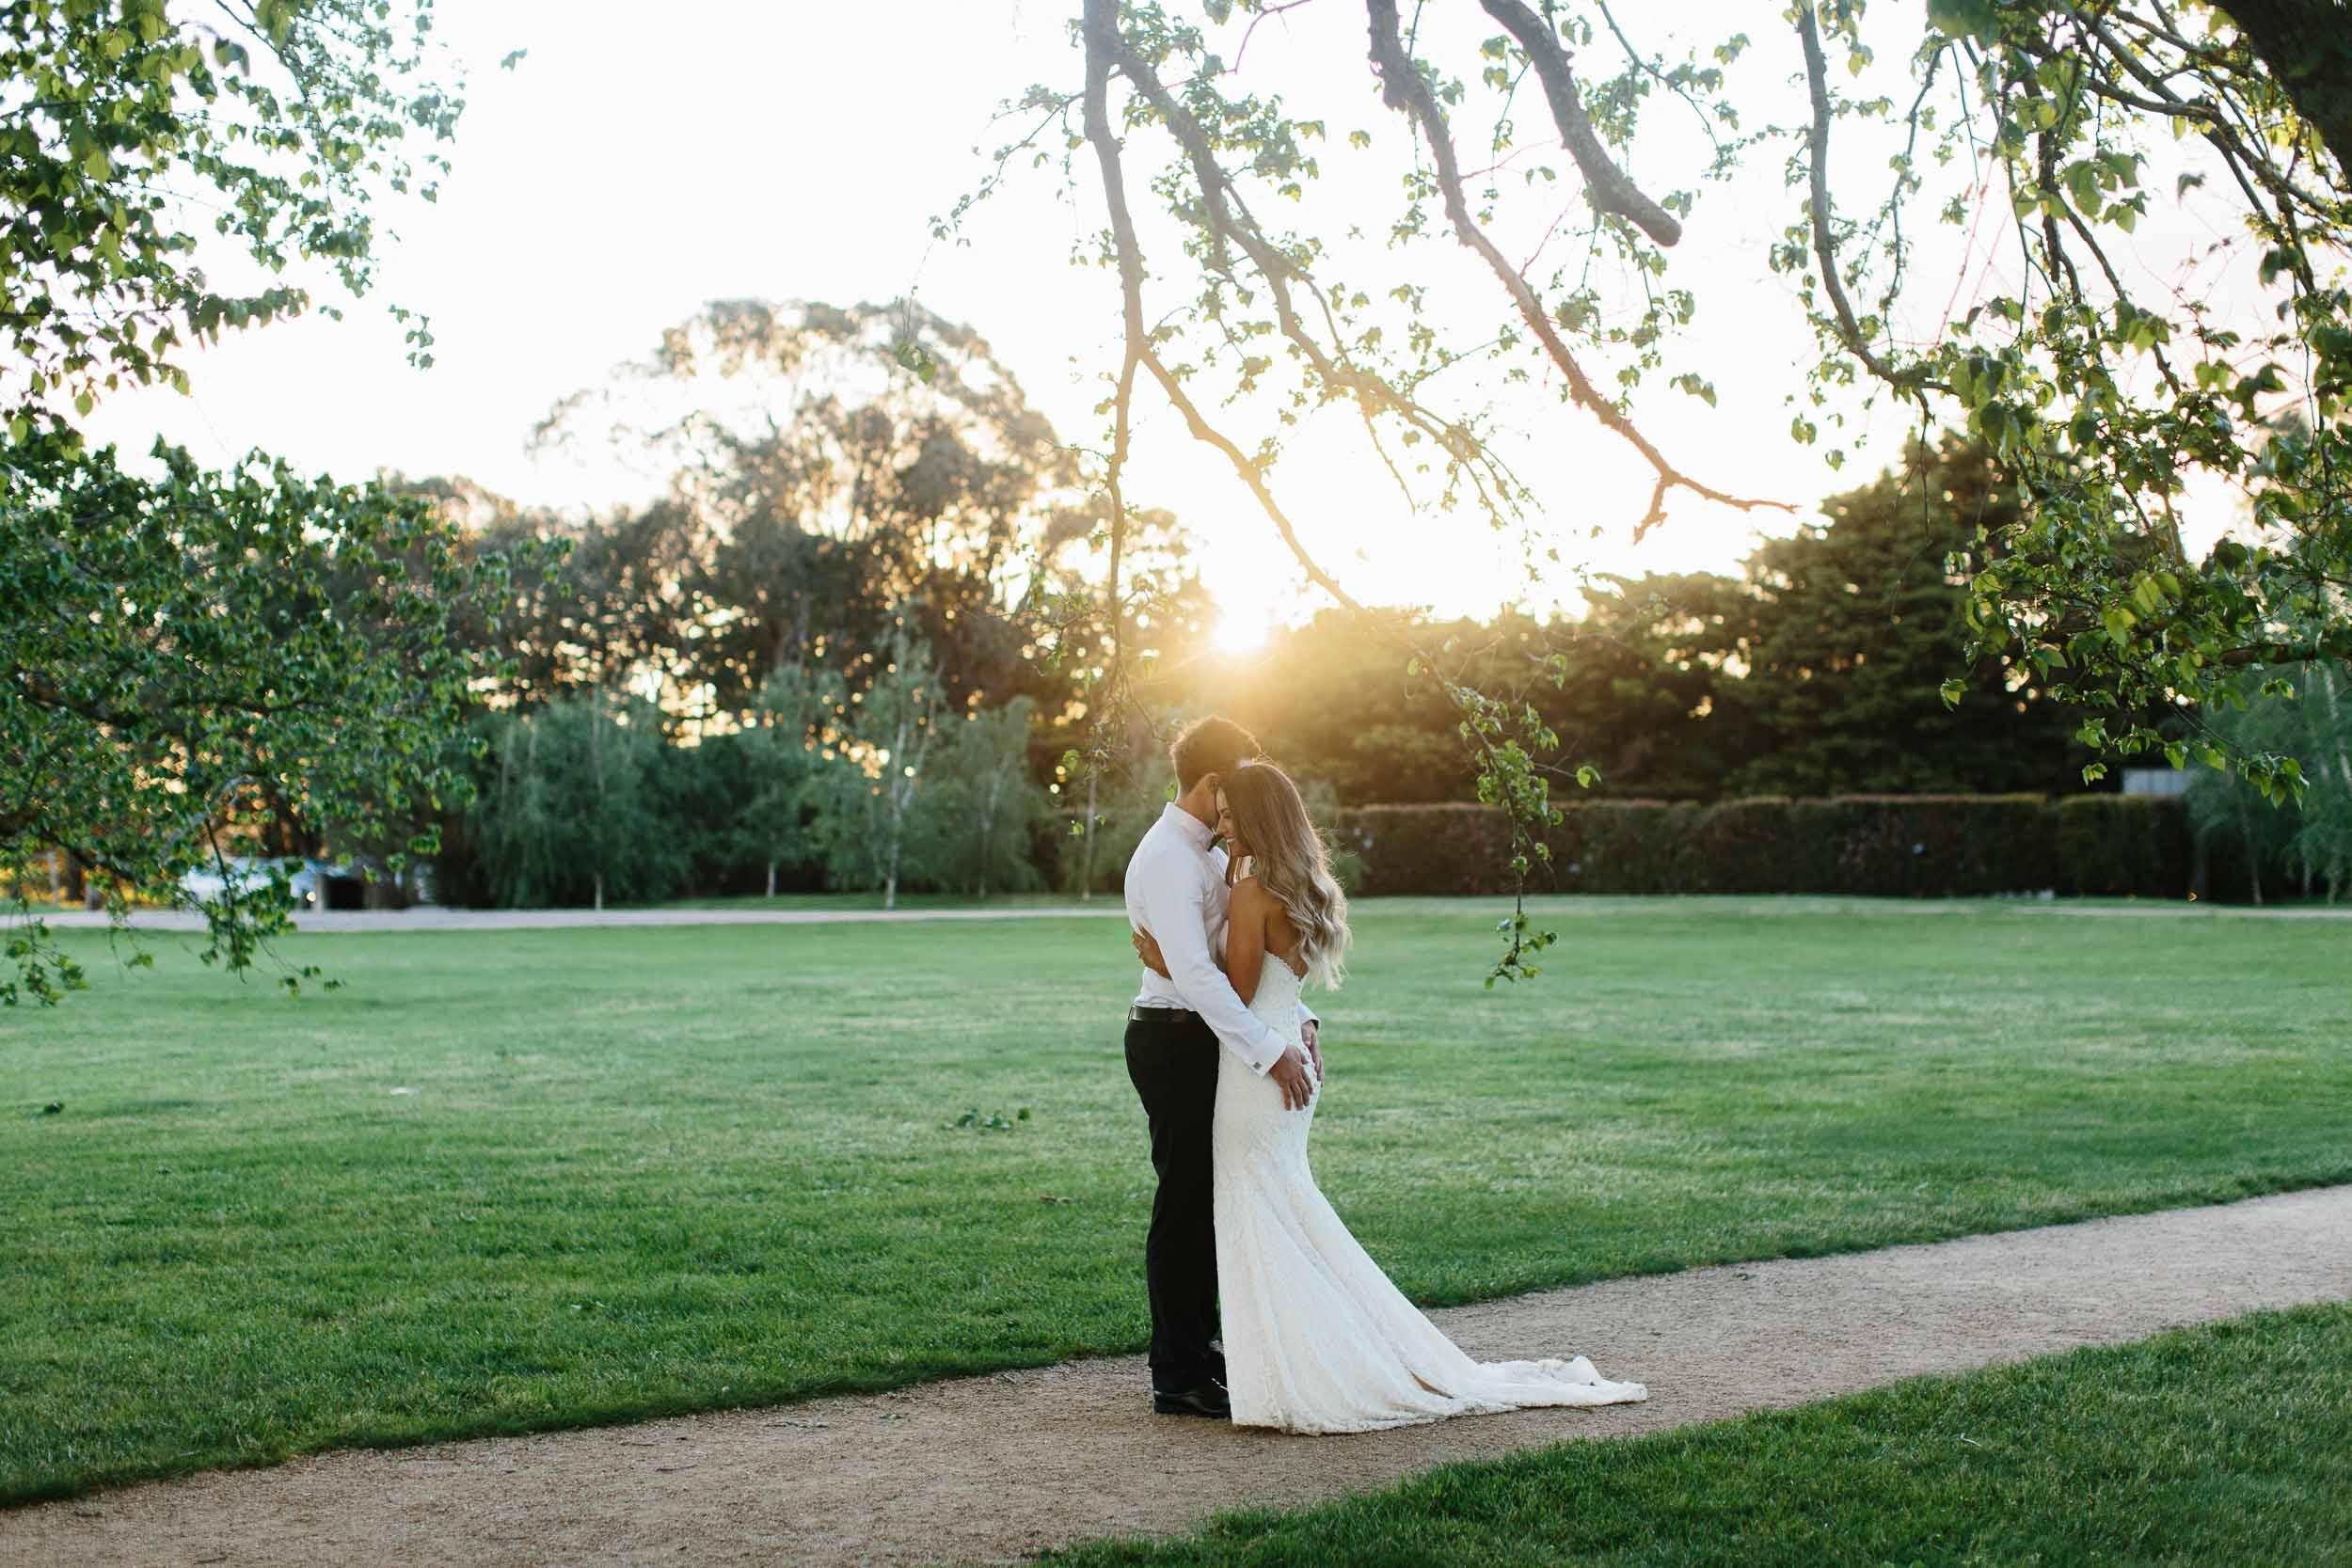 Kas-Richards-Stones-of-the-Yarra-Valley-Wedding-829.jpg